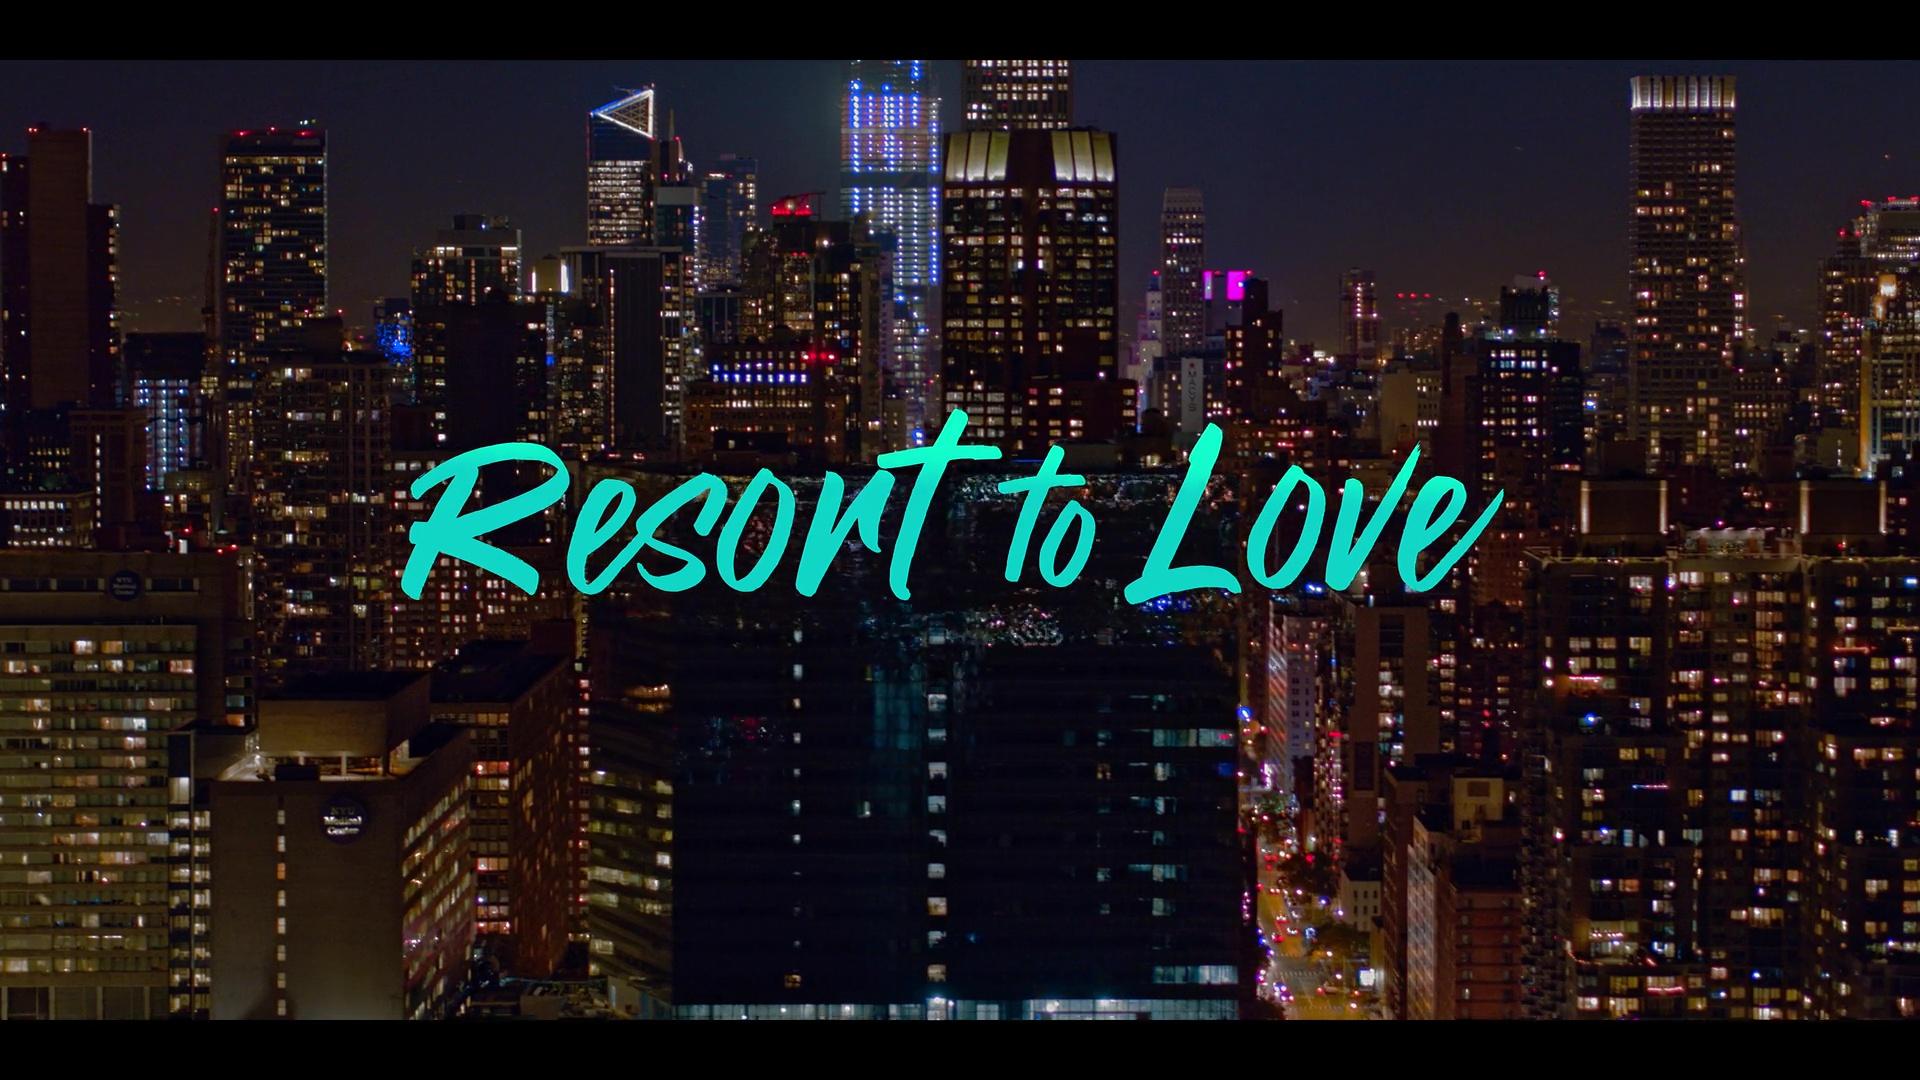 El resort del amor (2021) 1080p WEB-DL Latino